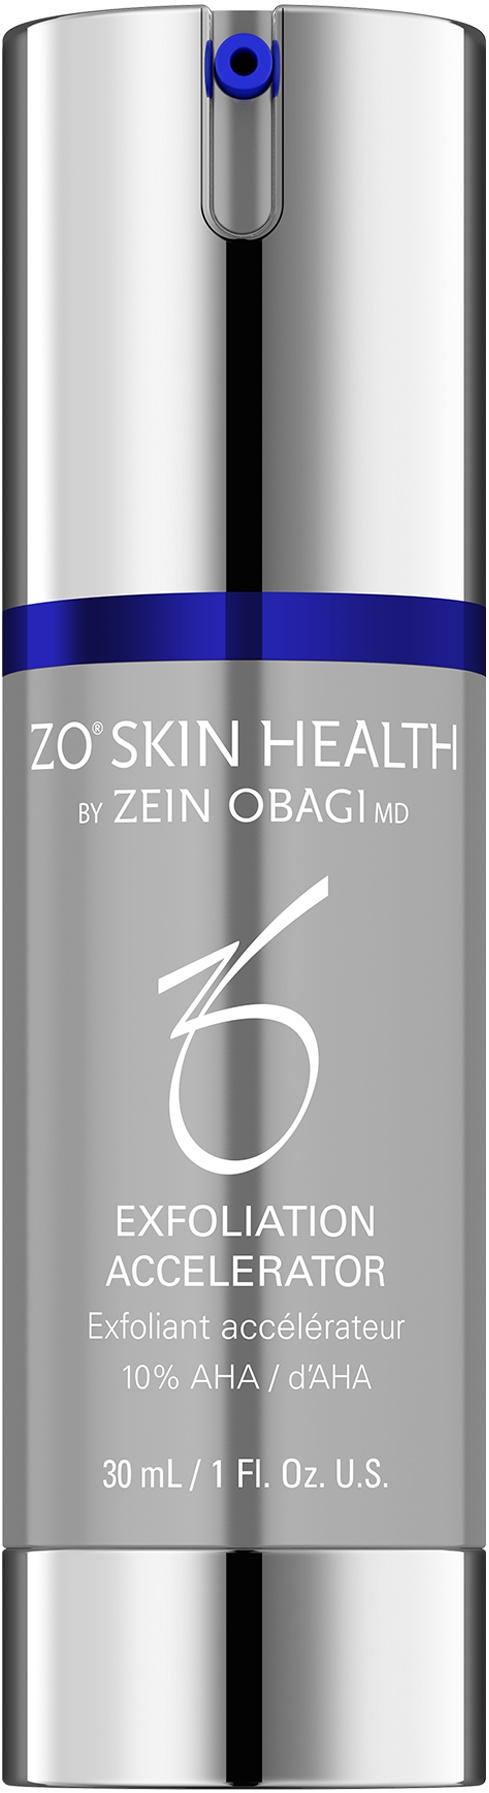 Zo Skin Health Zein Obagi Exfoliation Accelator